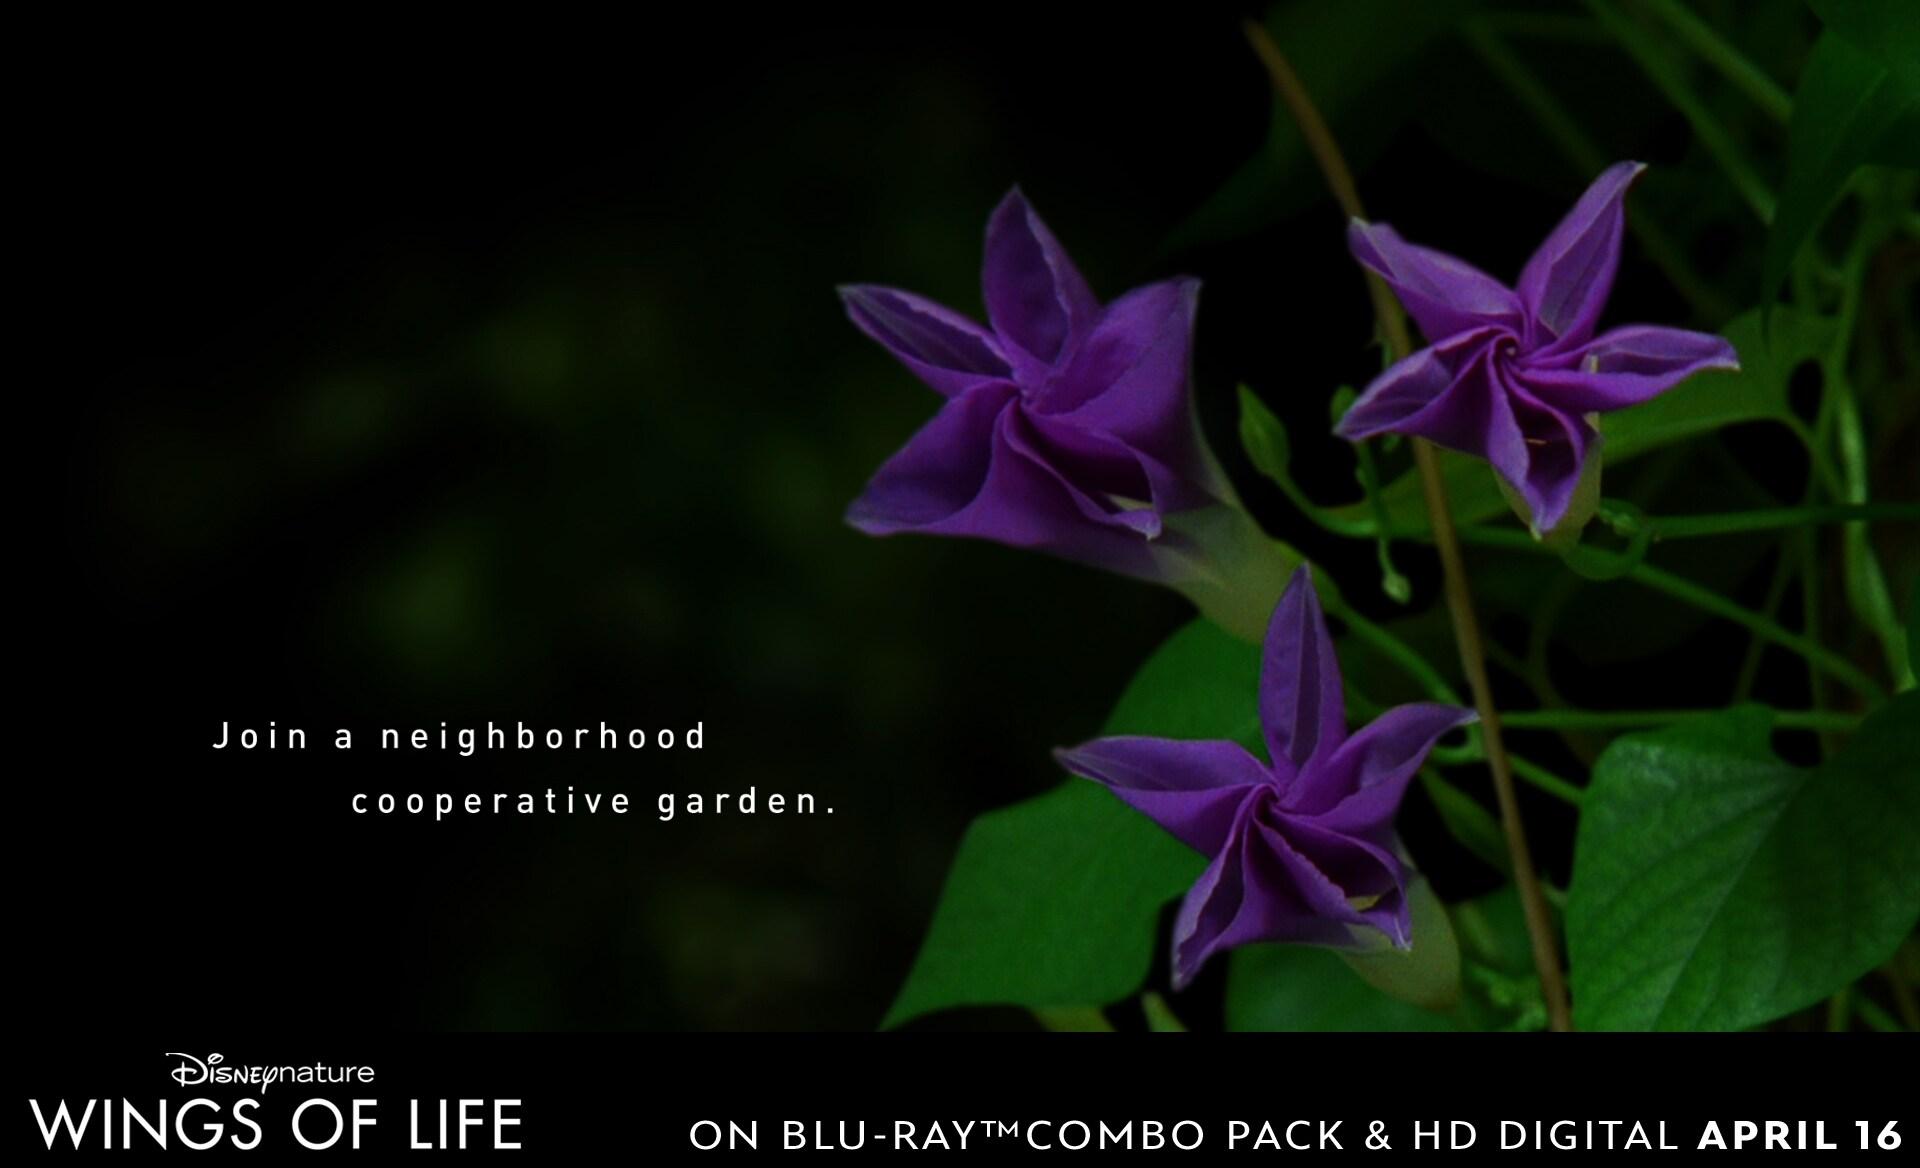 Join a neighborhood cooperative garden.